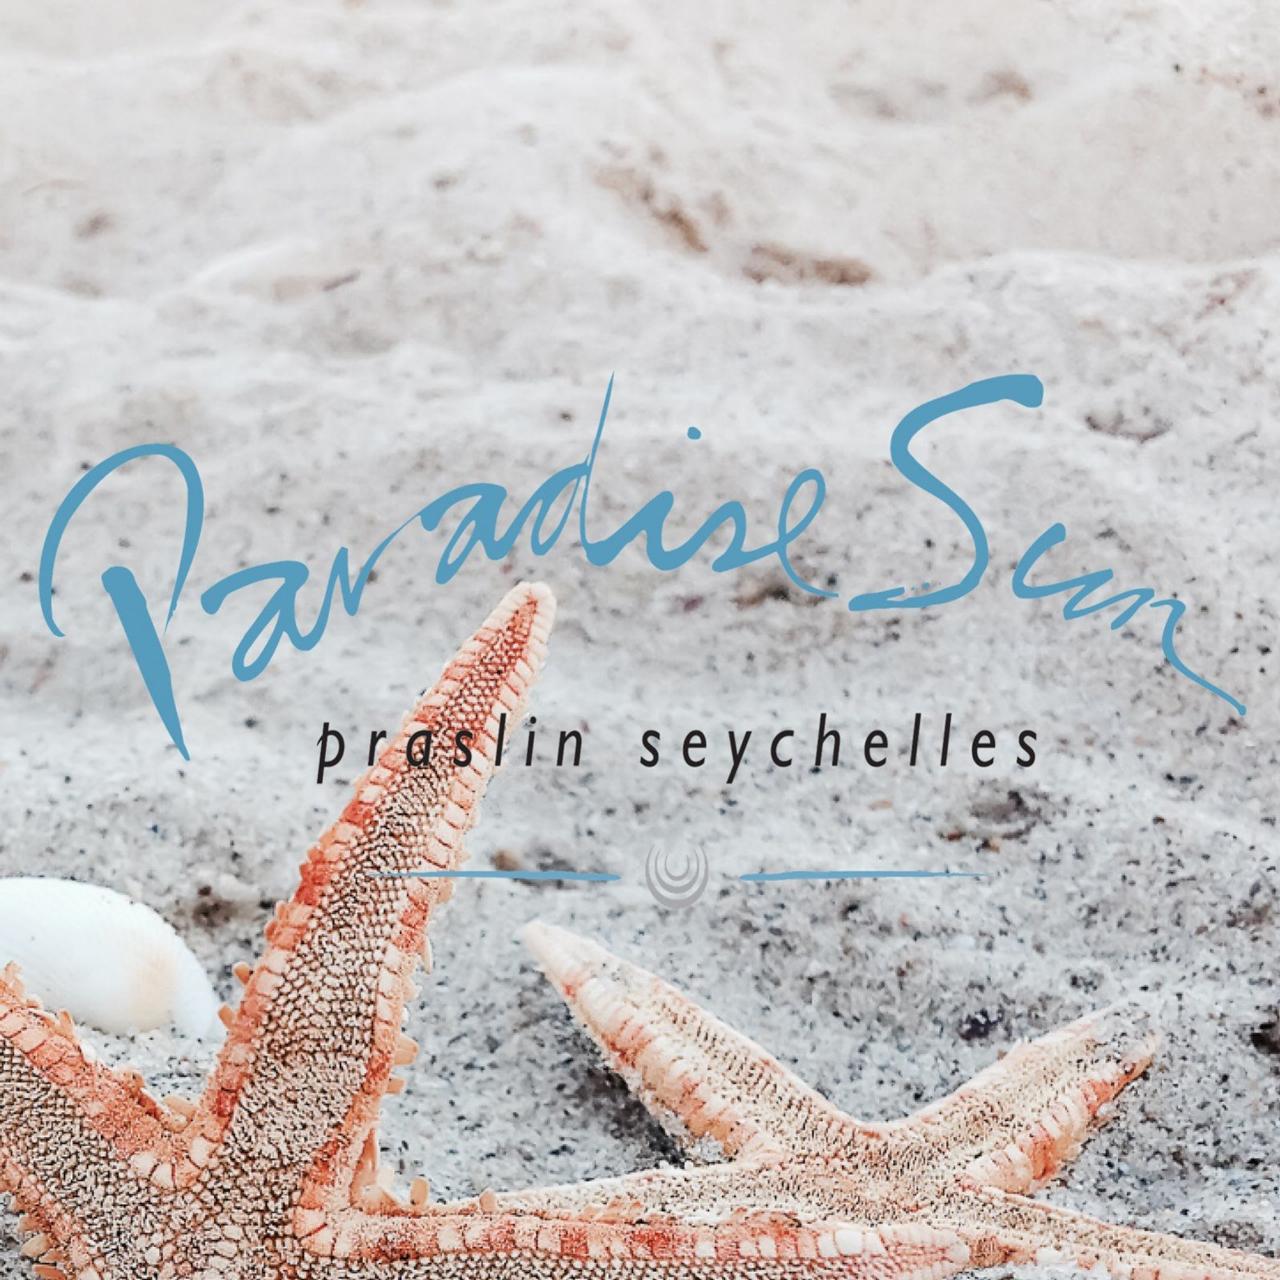 paradise-sun-seychelle-indan-ocean